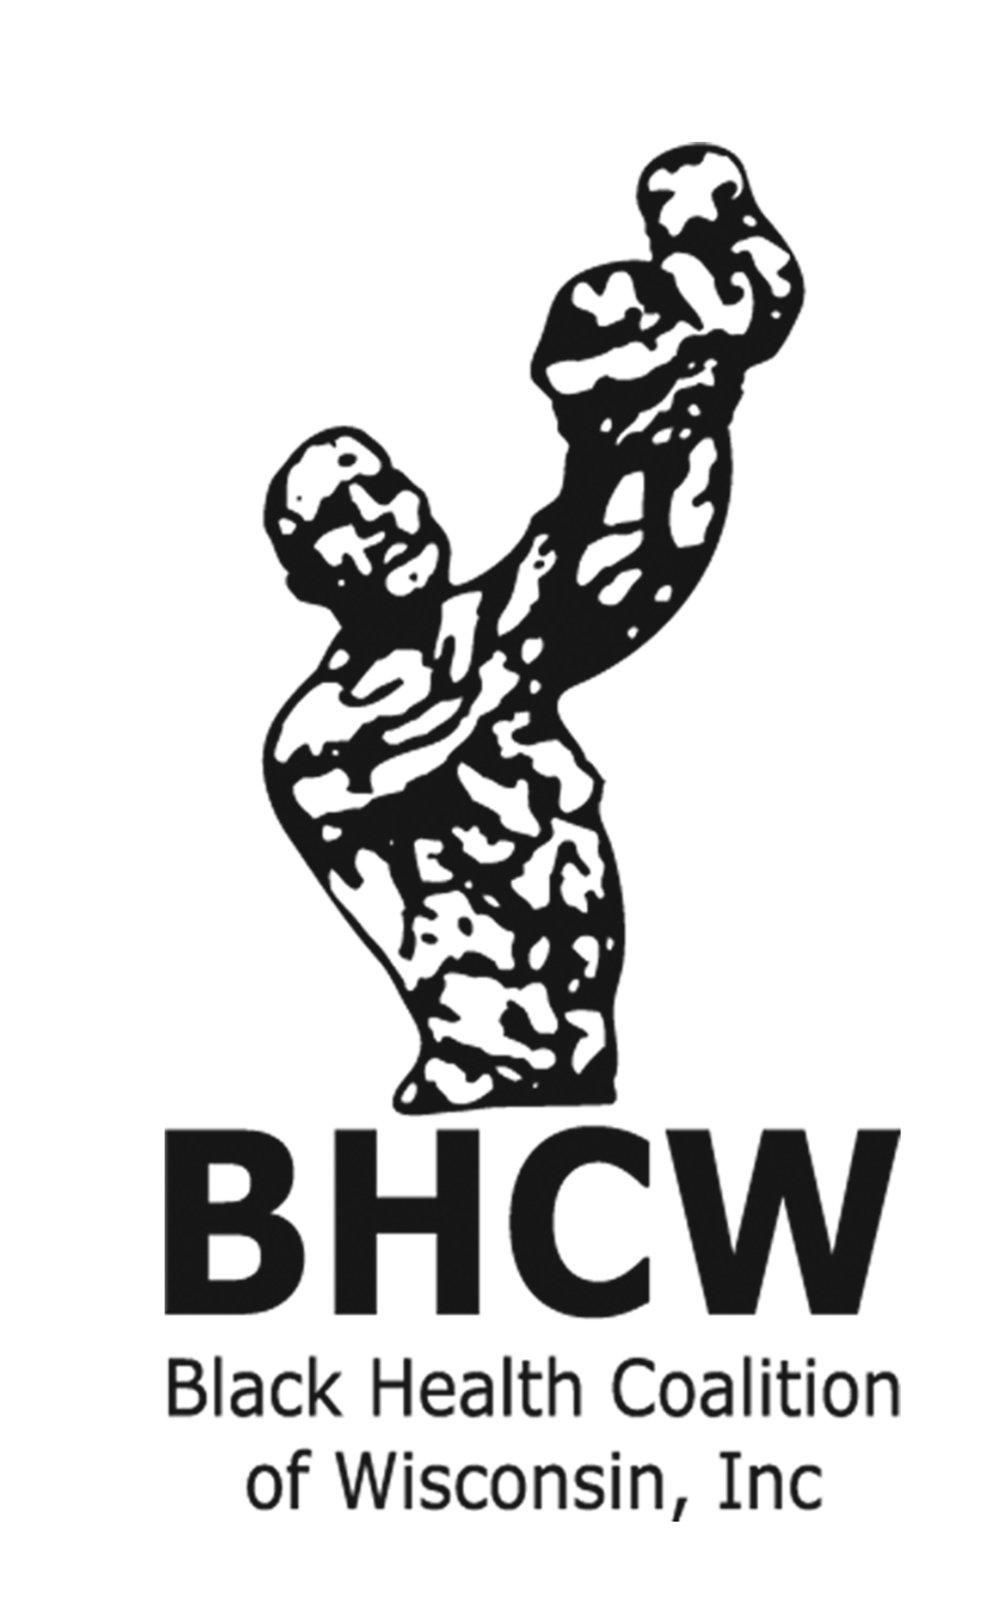 BHCW.jpg